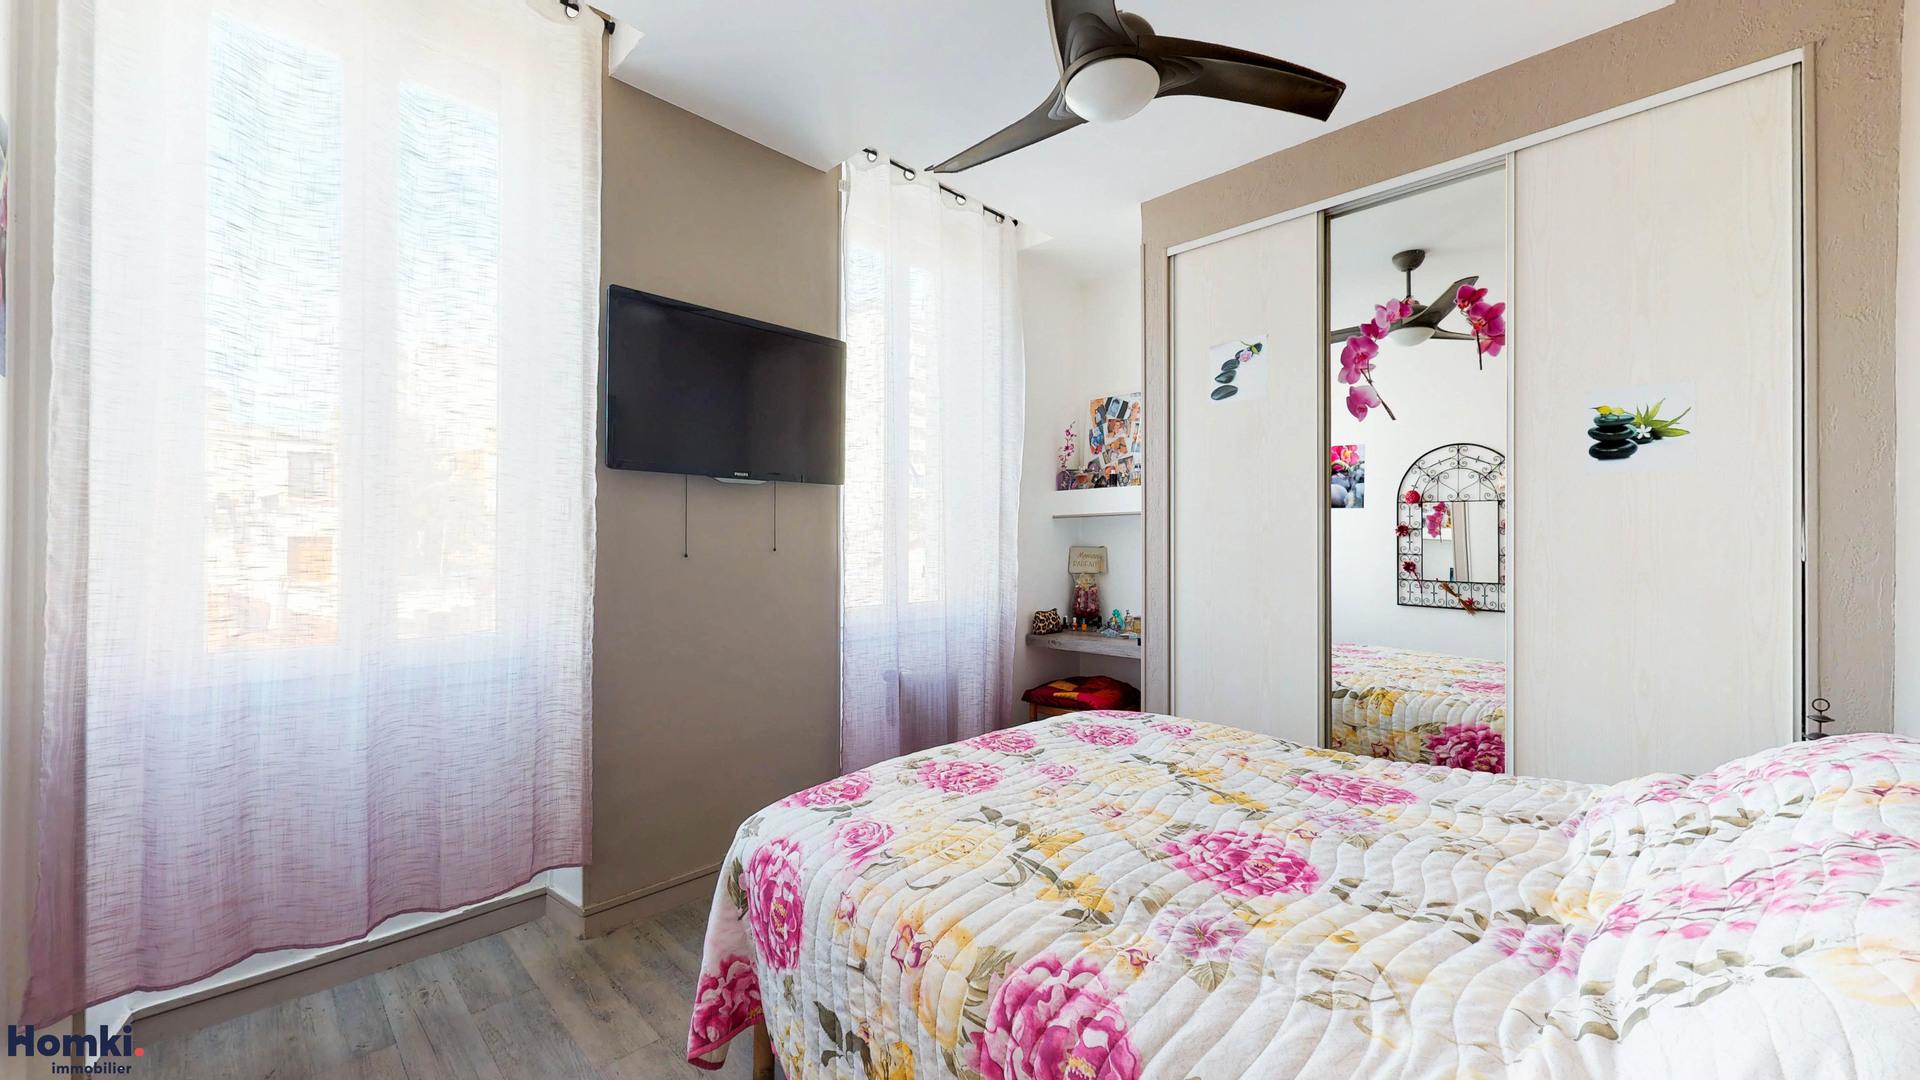 Vente Appartement 80 m² T4 13014 Marseille_5